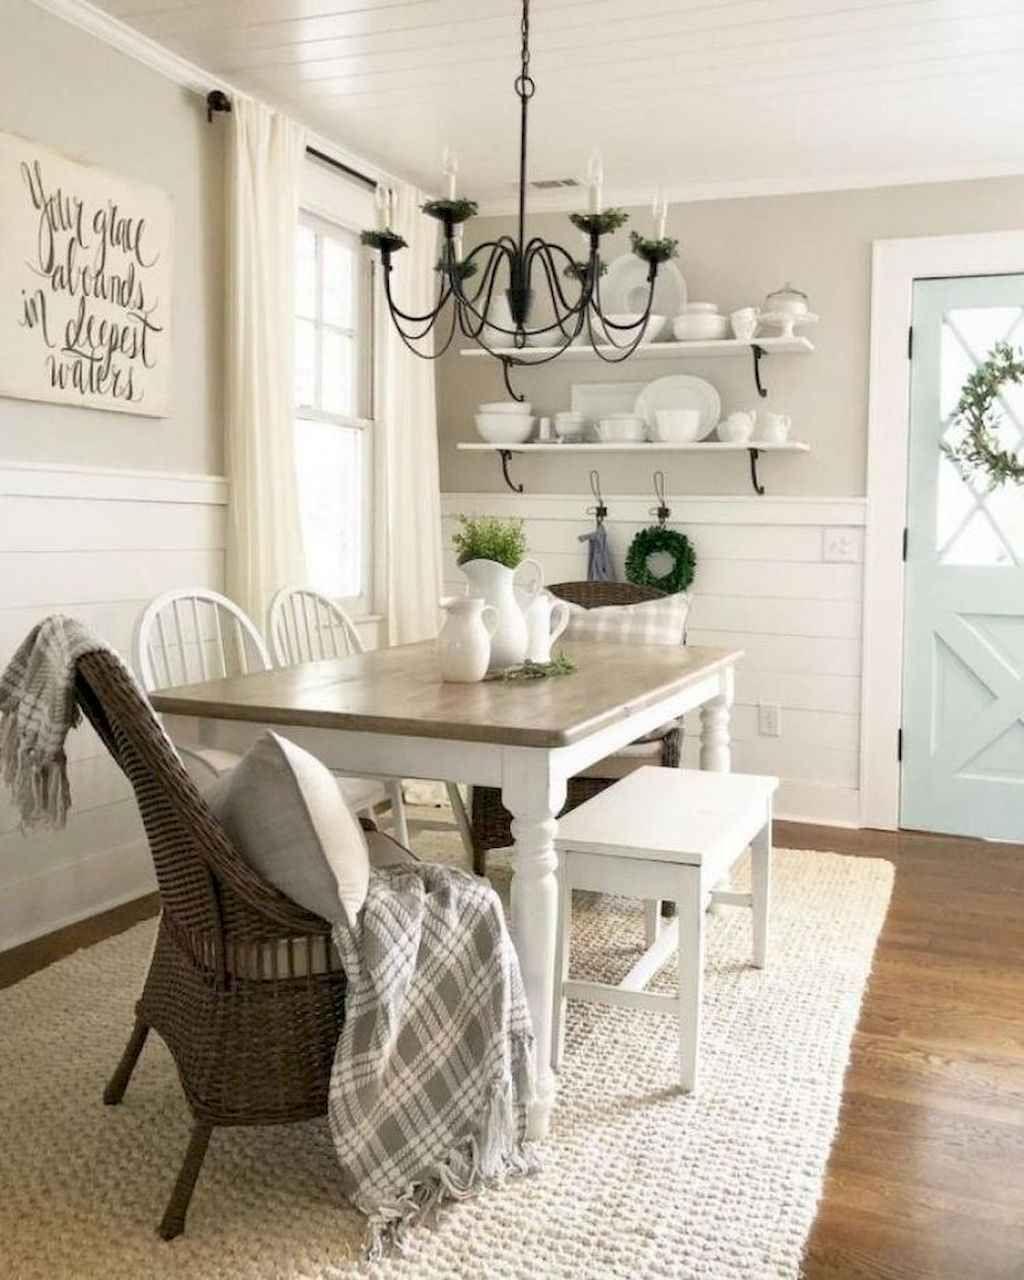 01 Beautiful Farmhouse Dining Room Table Design Ideas Home Ideas